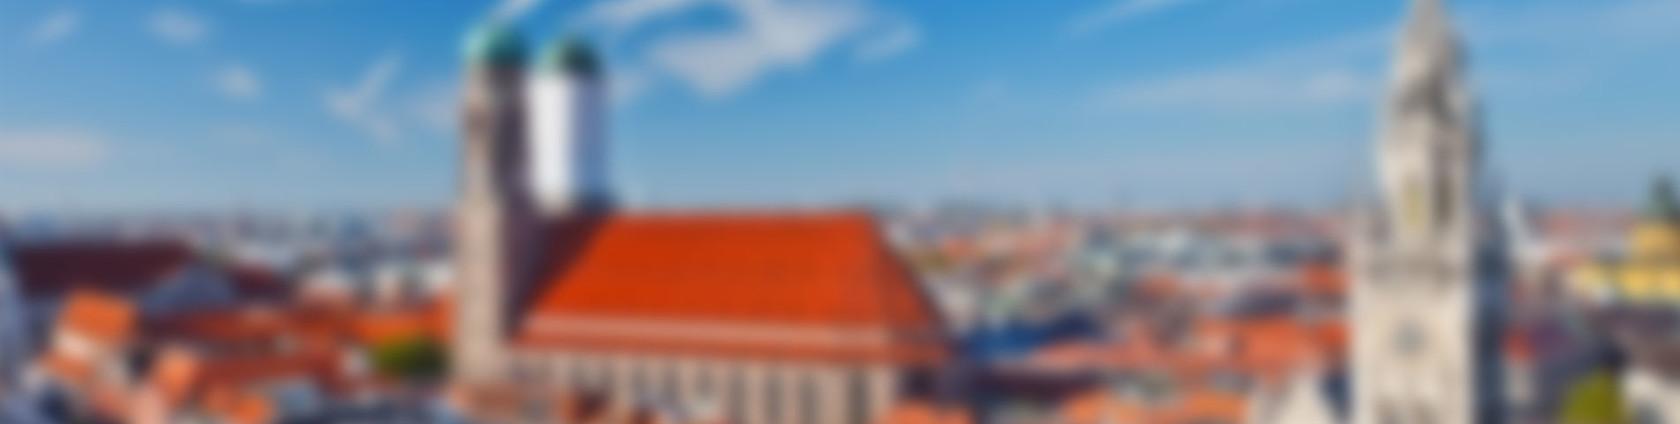 Umzüge Berlin Spandau ps umzüge nah fern ihr umzugsunternehmen in berlin